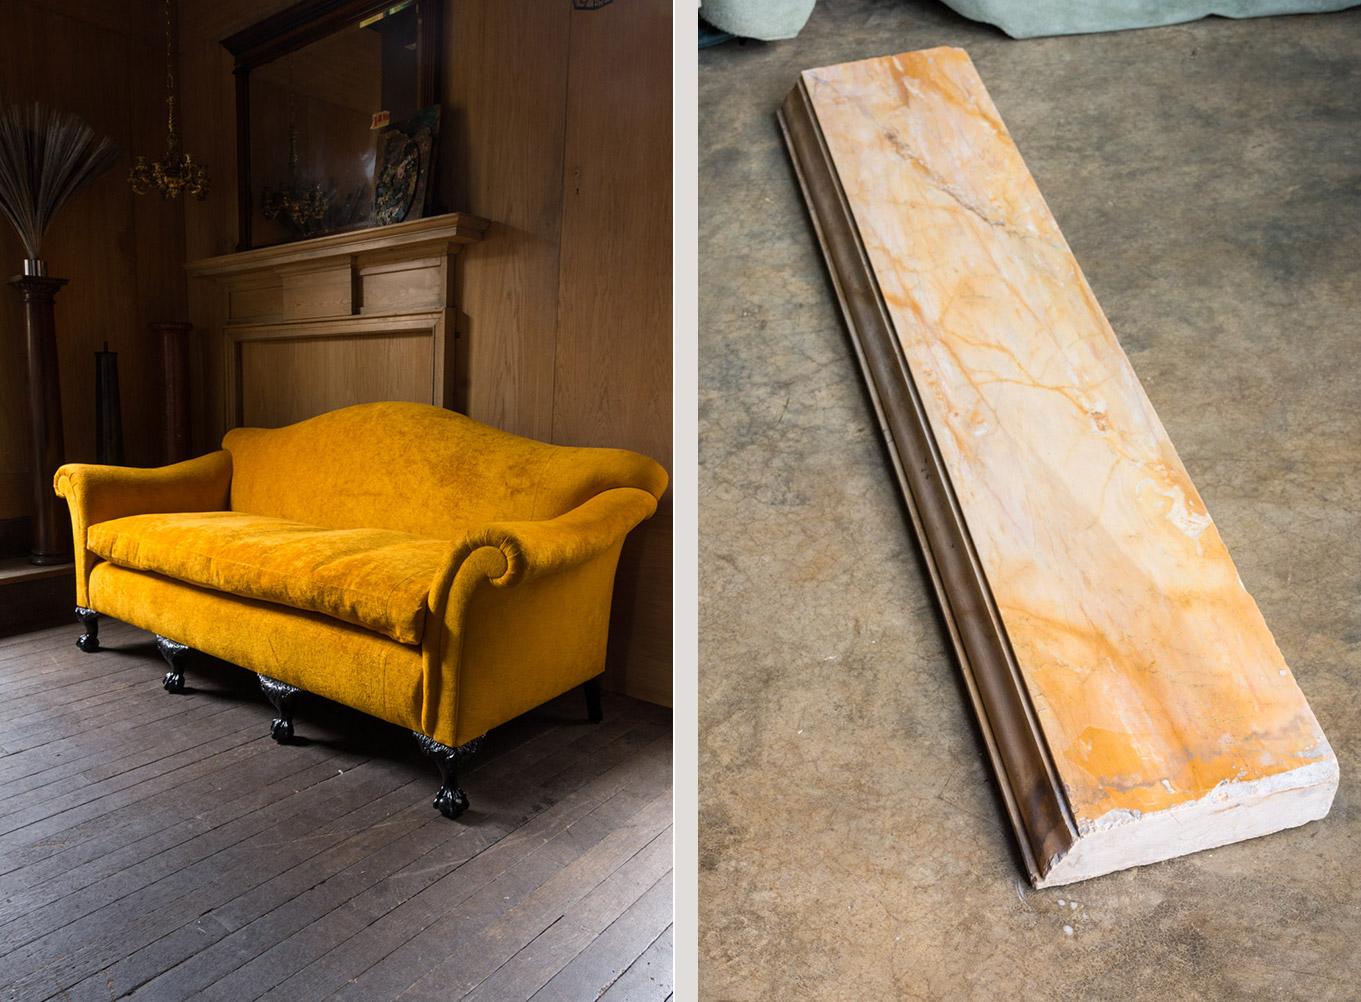 Sienna marble shelves and a Georgian style sofa